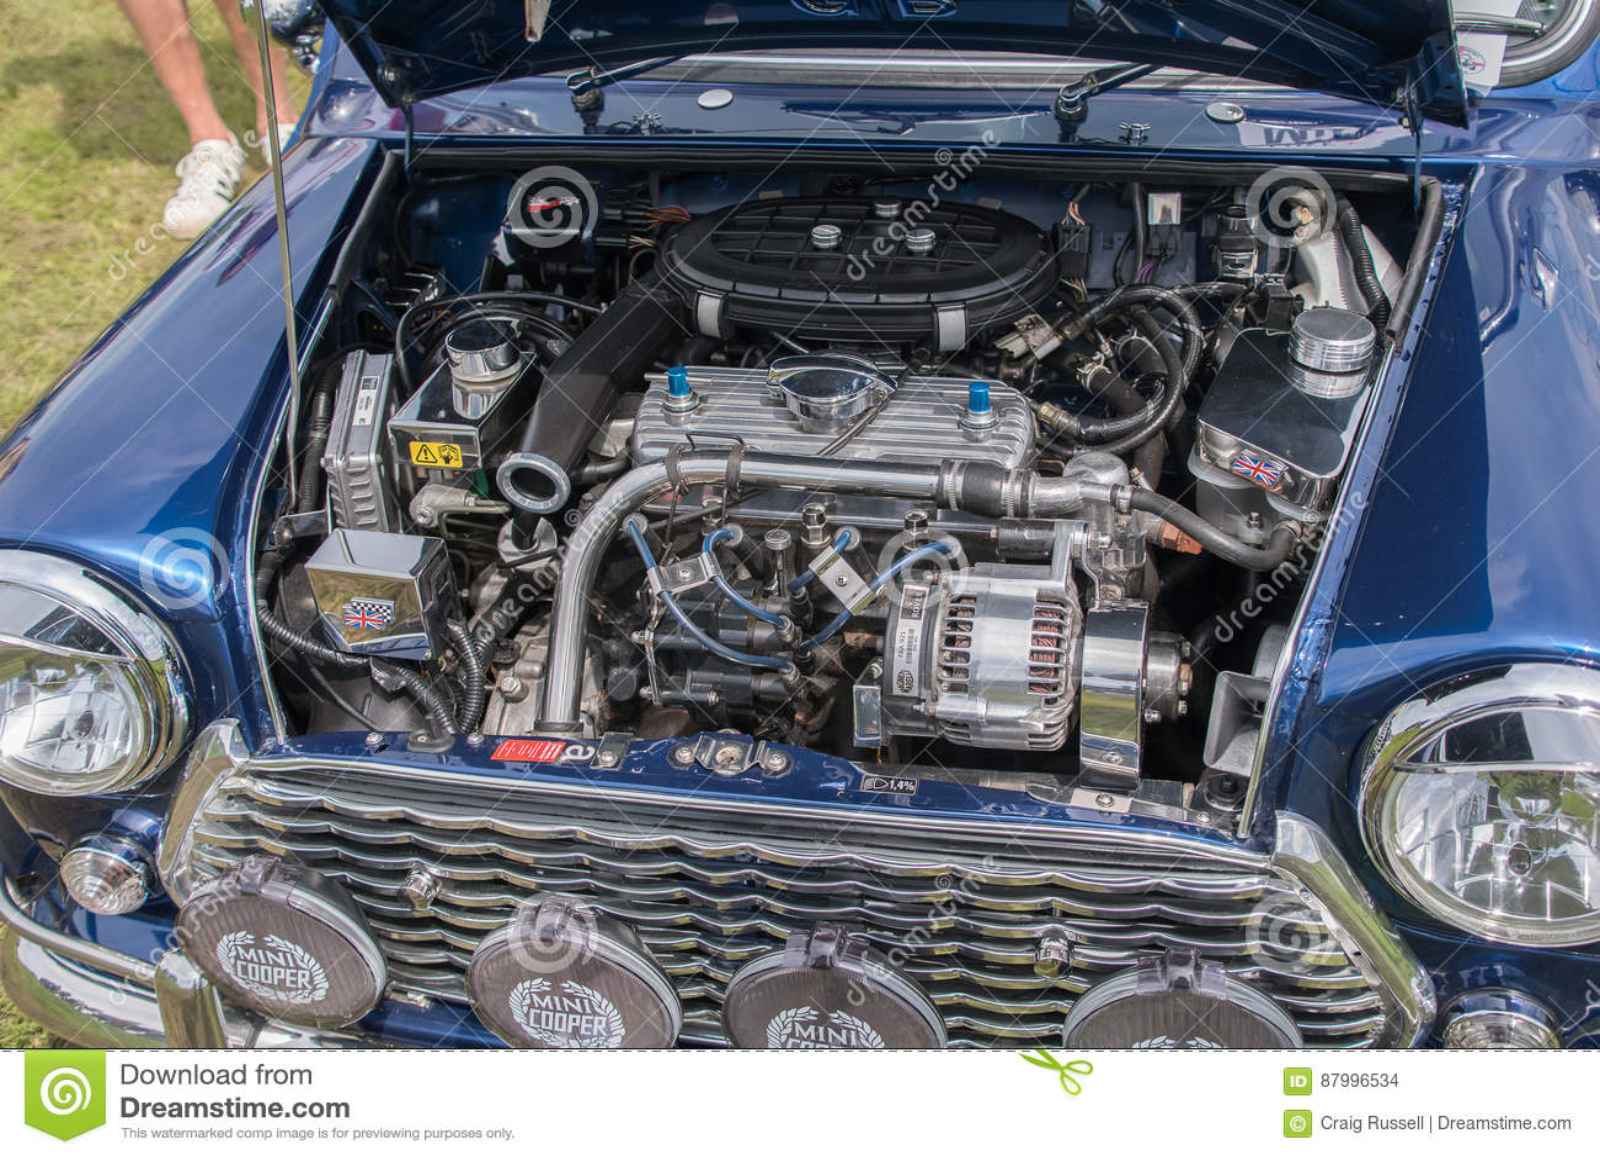 Mini Cooper Engine Editorial Stock Image Image Of Classic 87996534